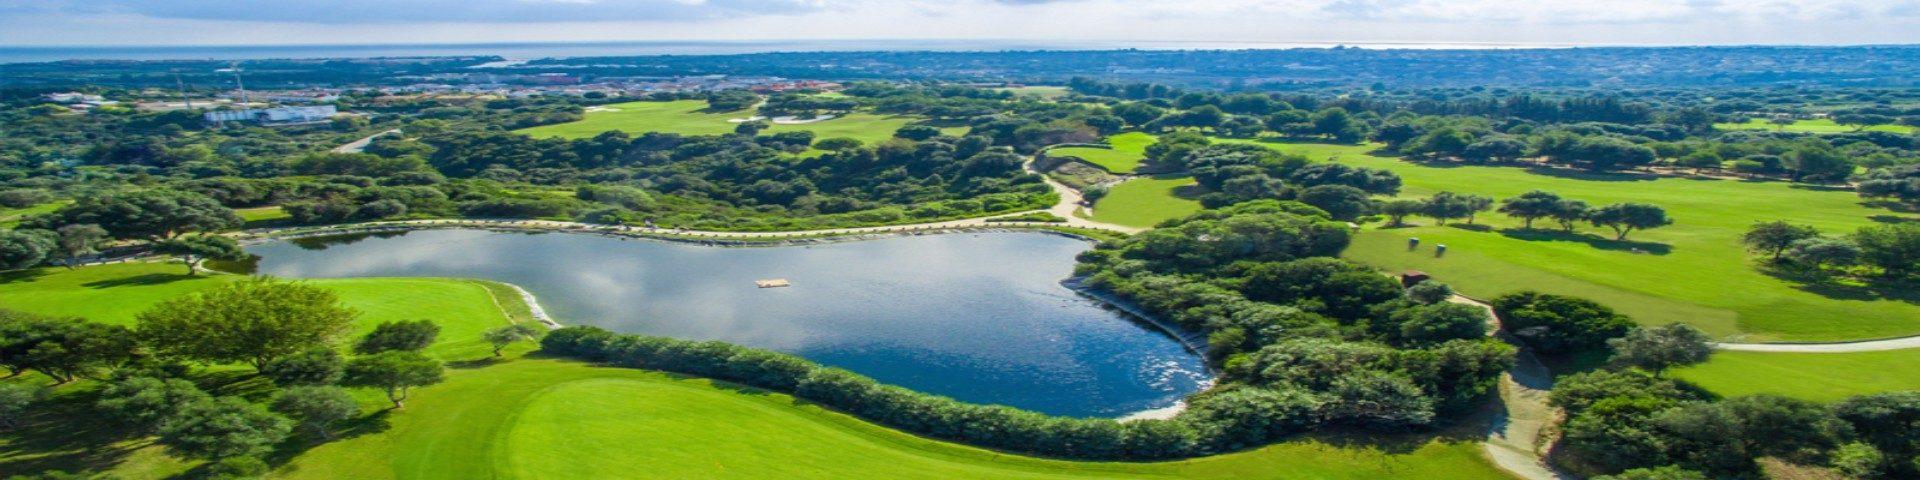 La Canada golf course costa del sol